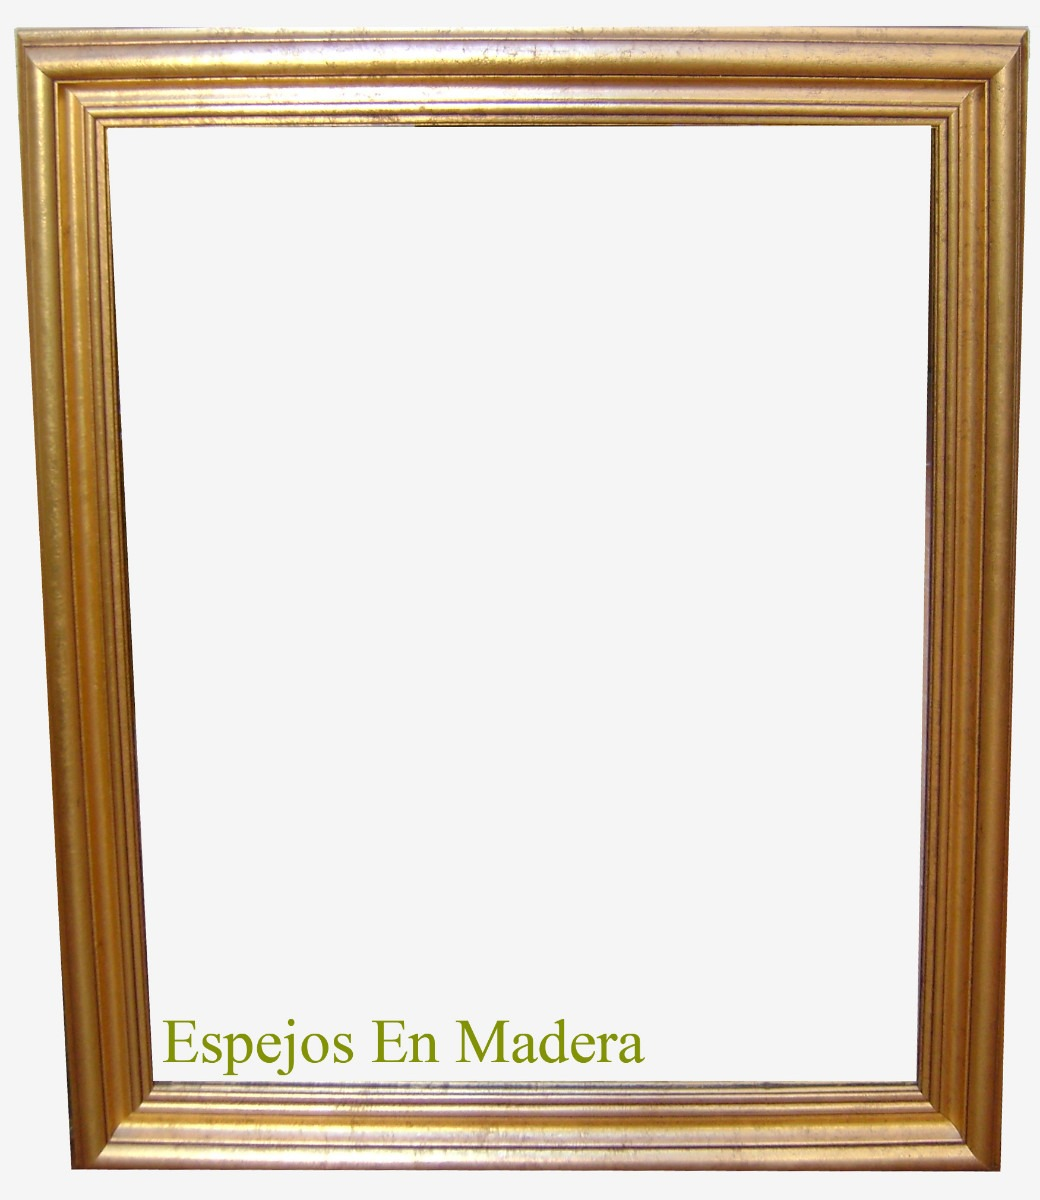 Espejos Marco Dorado O Plateado 5 Cm 50x60 - $ 1.250,00 en Mercado Libre